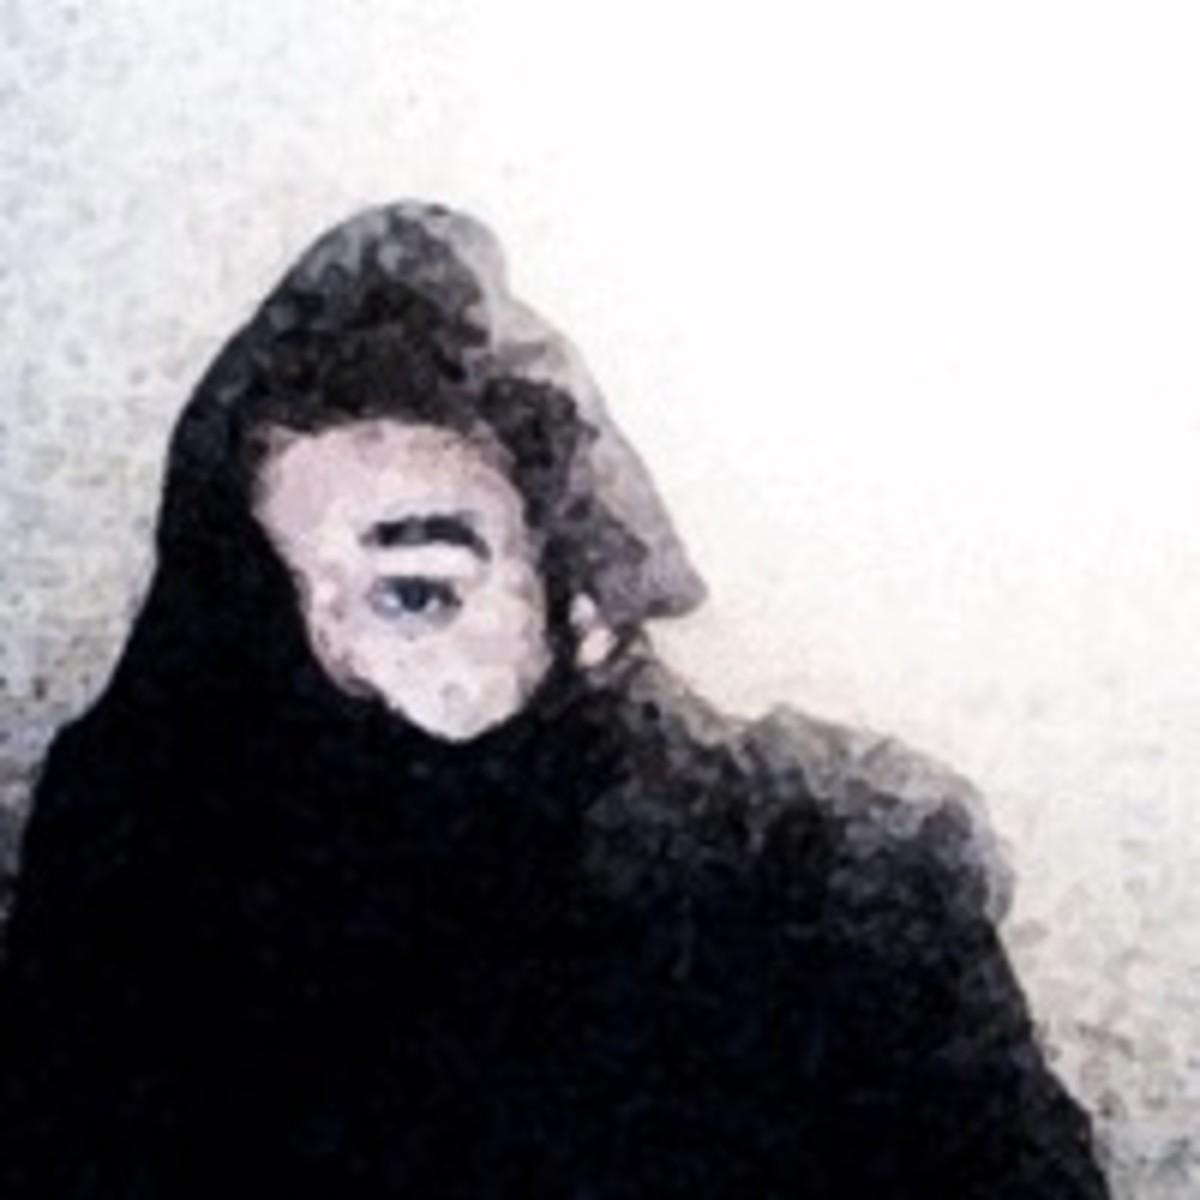 avatars-000002470966-rnafyp-t200x200